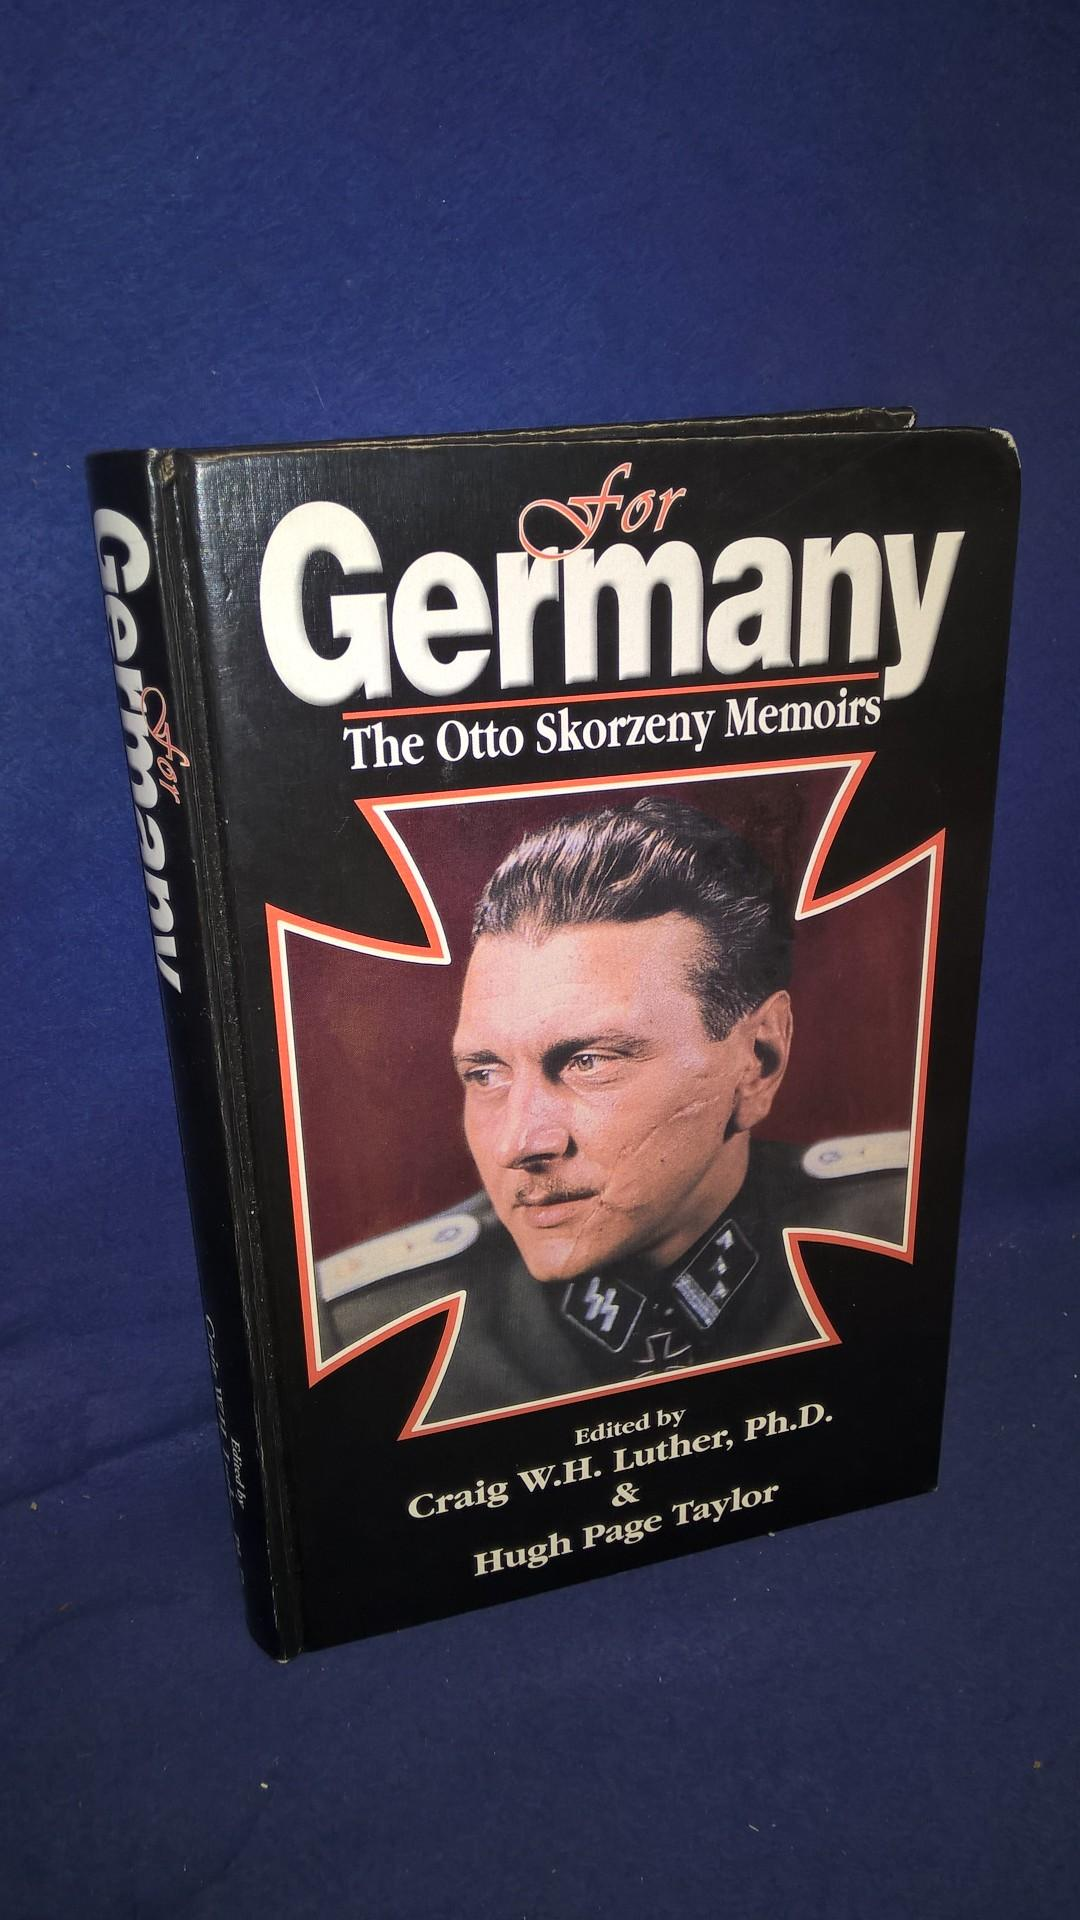 For Germany: The Otto Skorzeny Memoirs